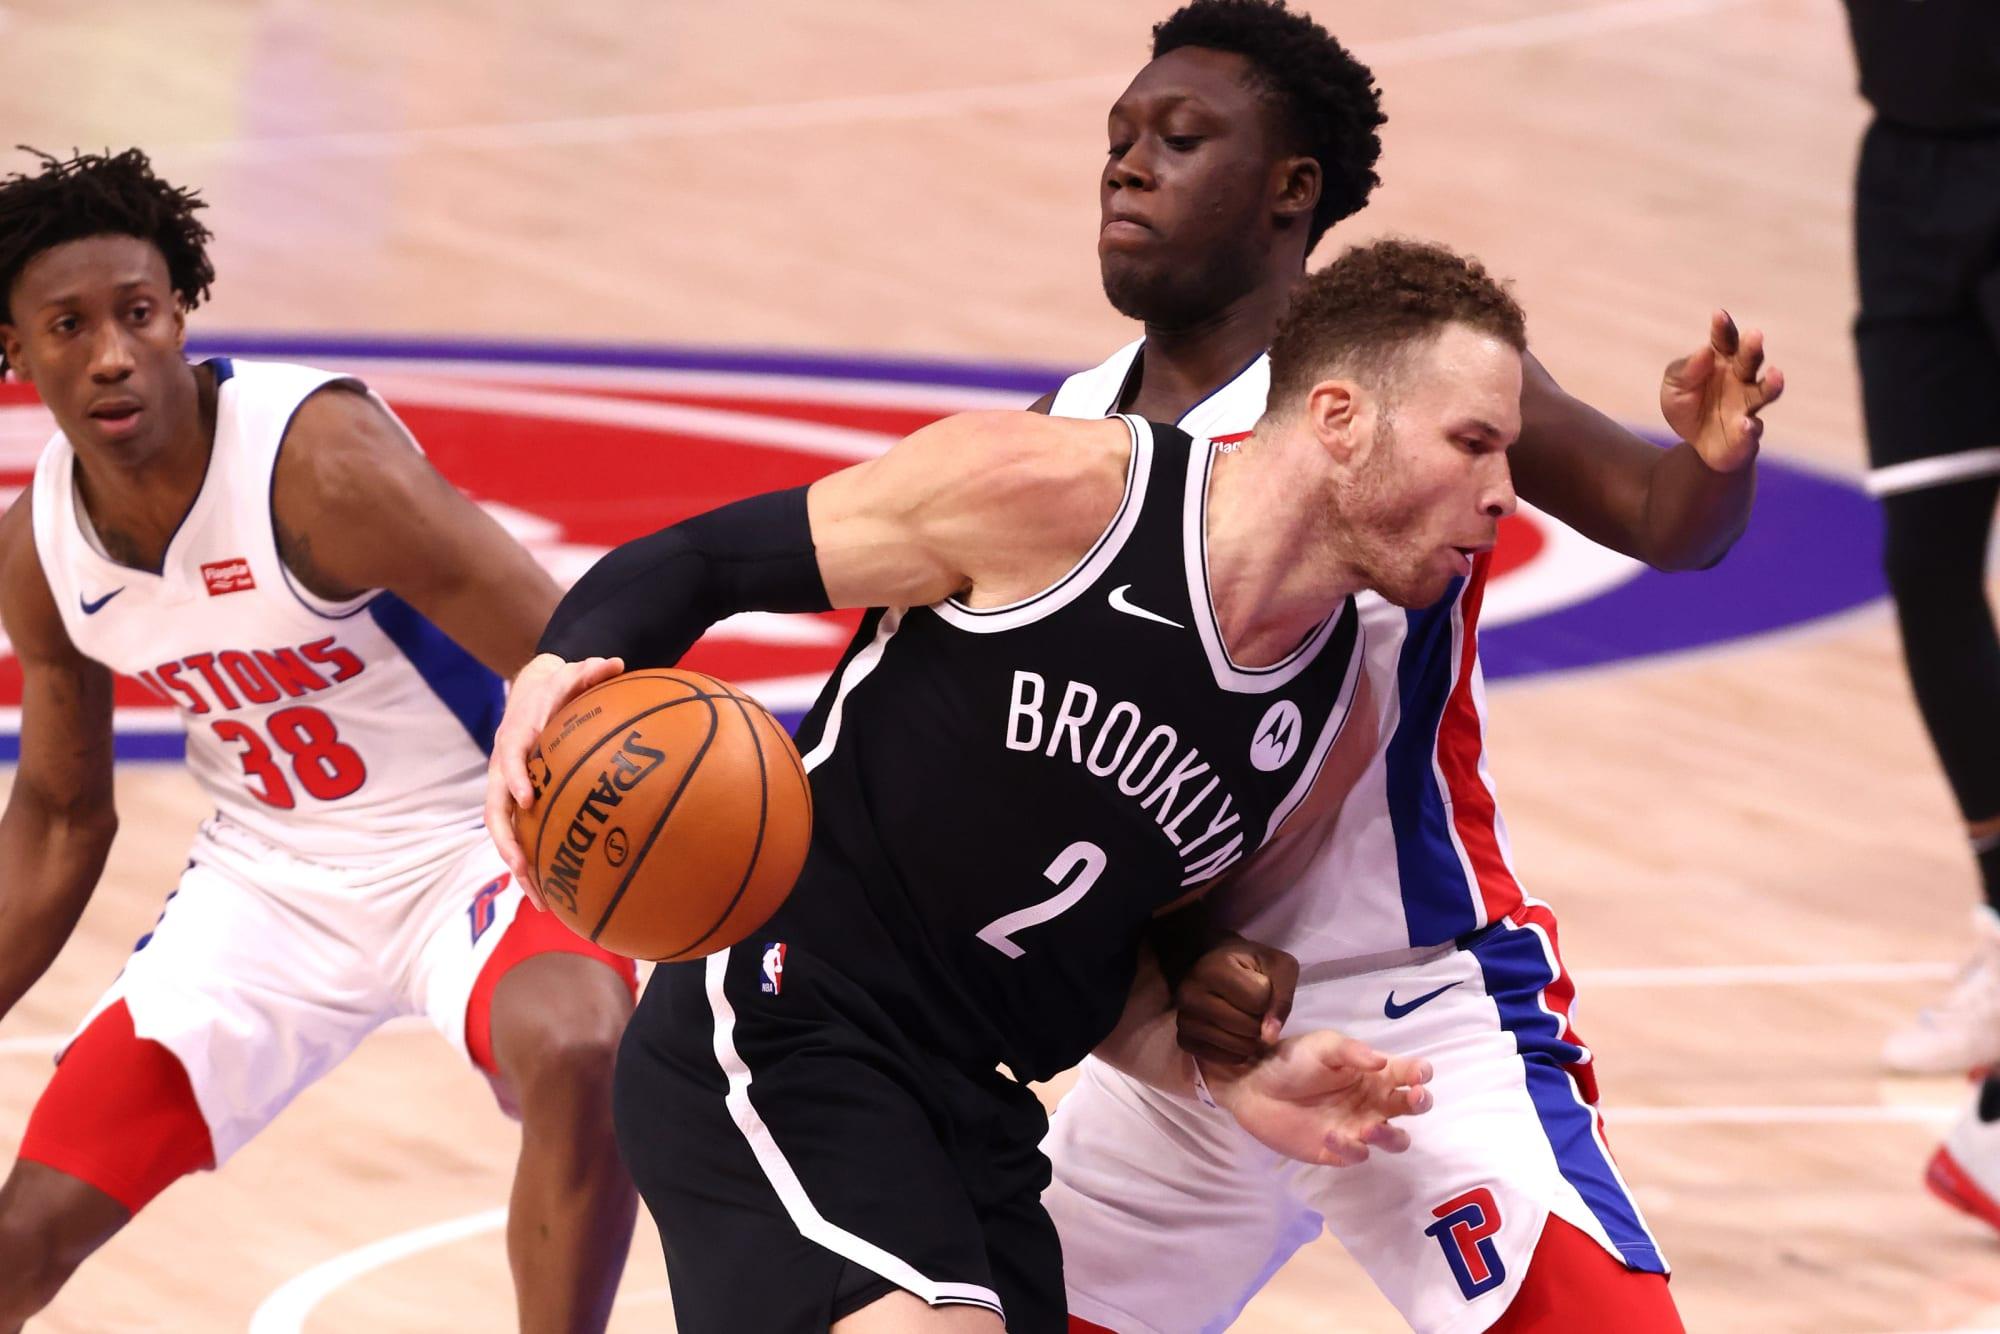 Detroit Pistons: Blake Griffin is now enemy #1 in Detroit